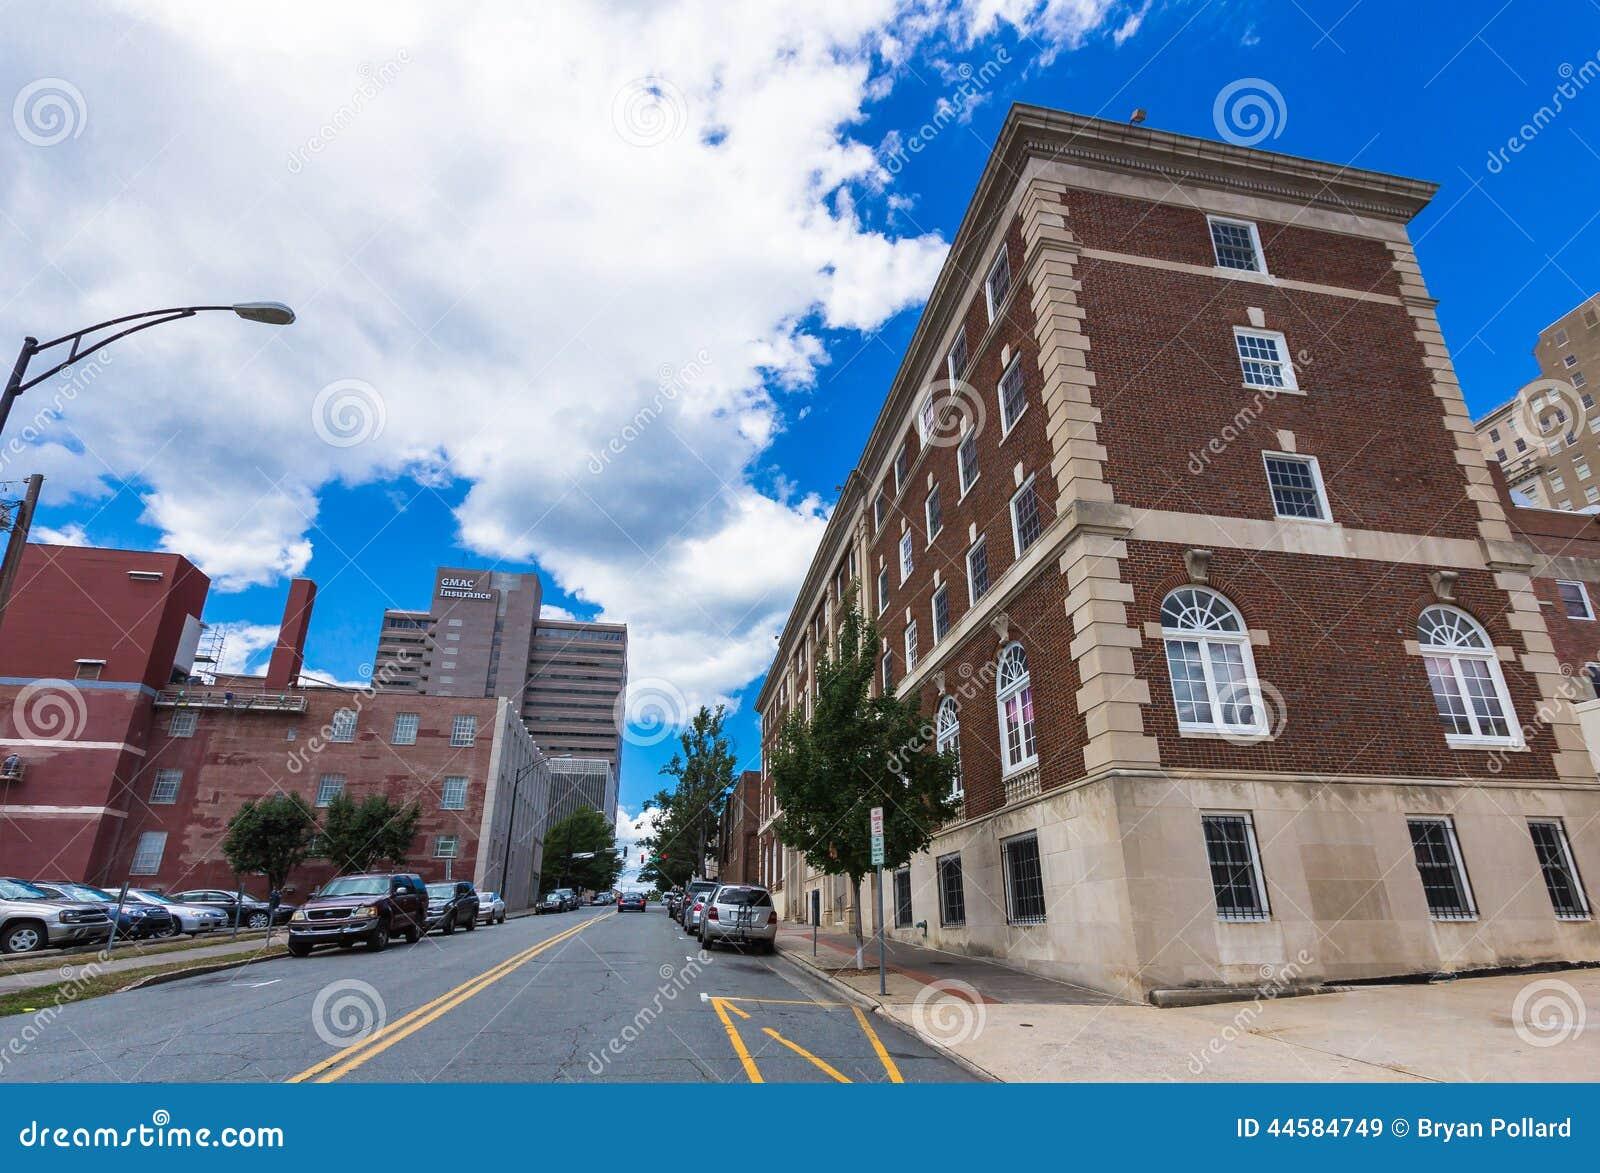 Downtown Winston Salem North Carolina From Spruce Street